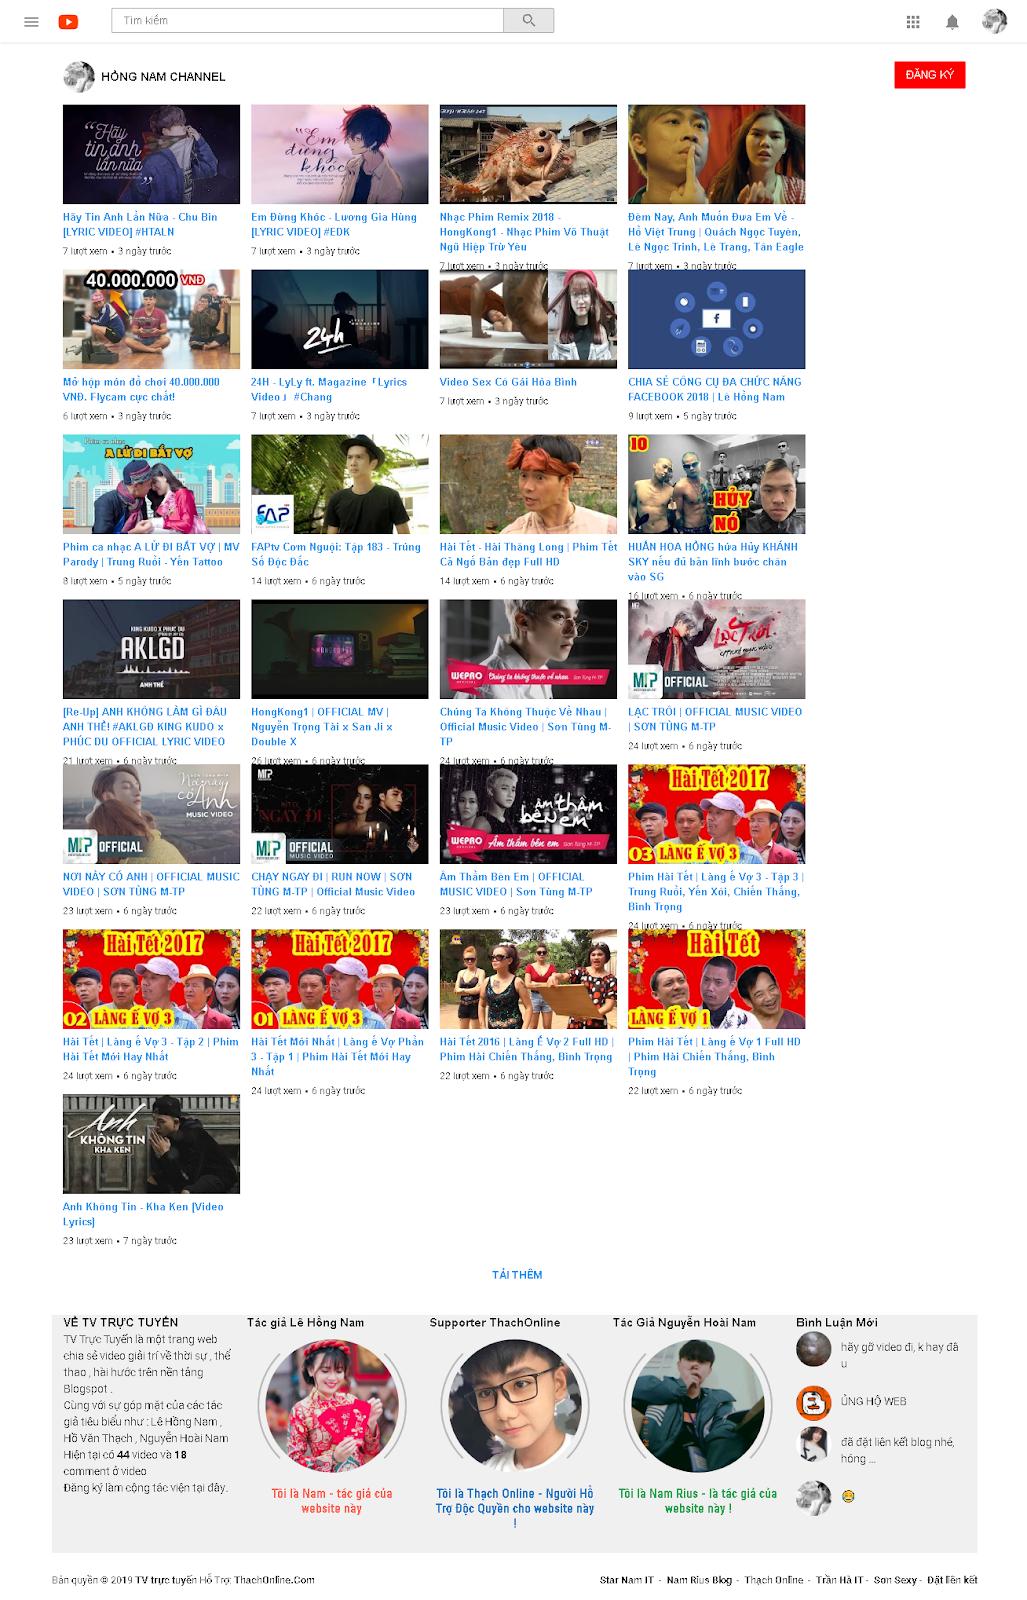 Shase Template Fake Youtube cực ngầu max chất 2018